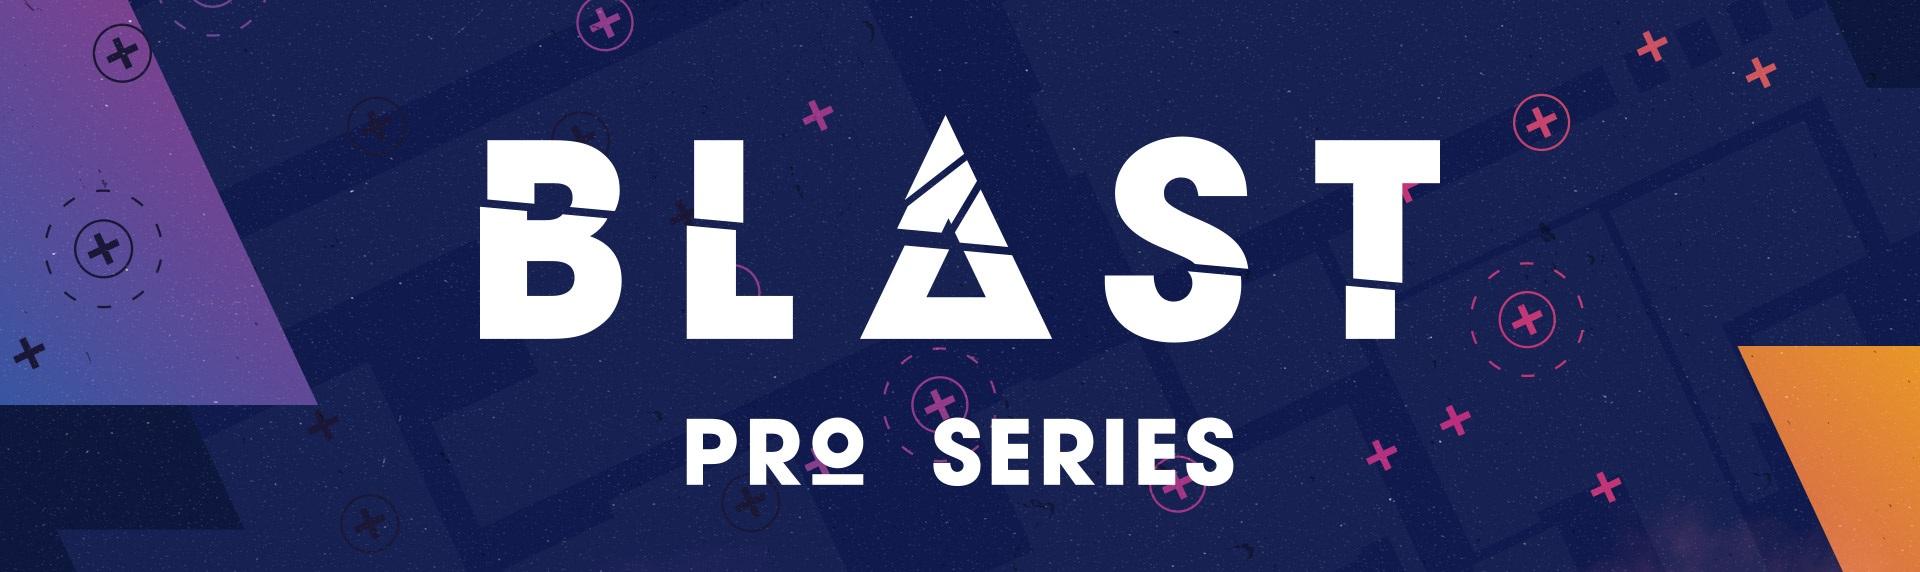 blast-pro-series.jpg